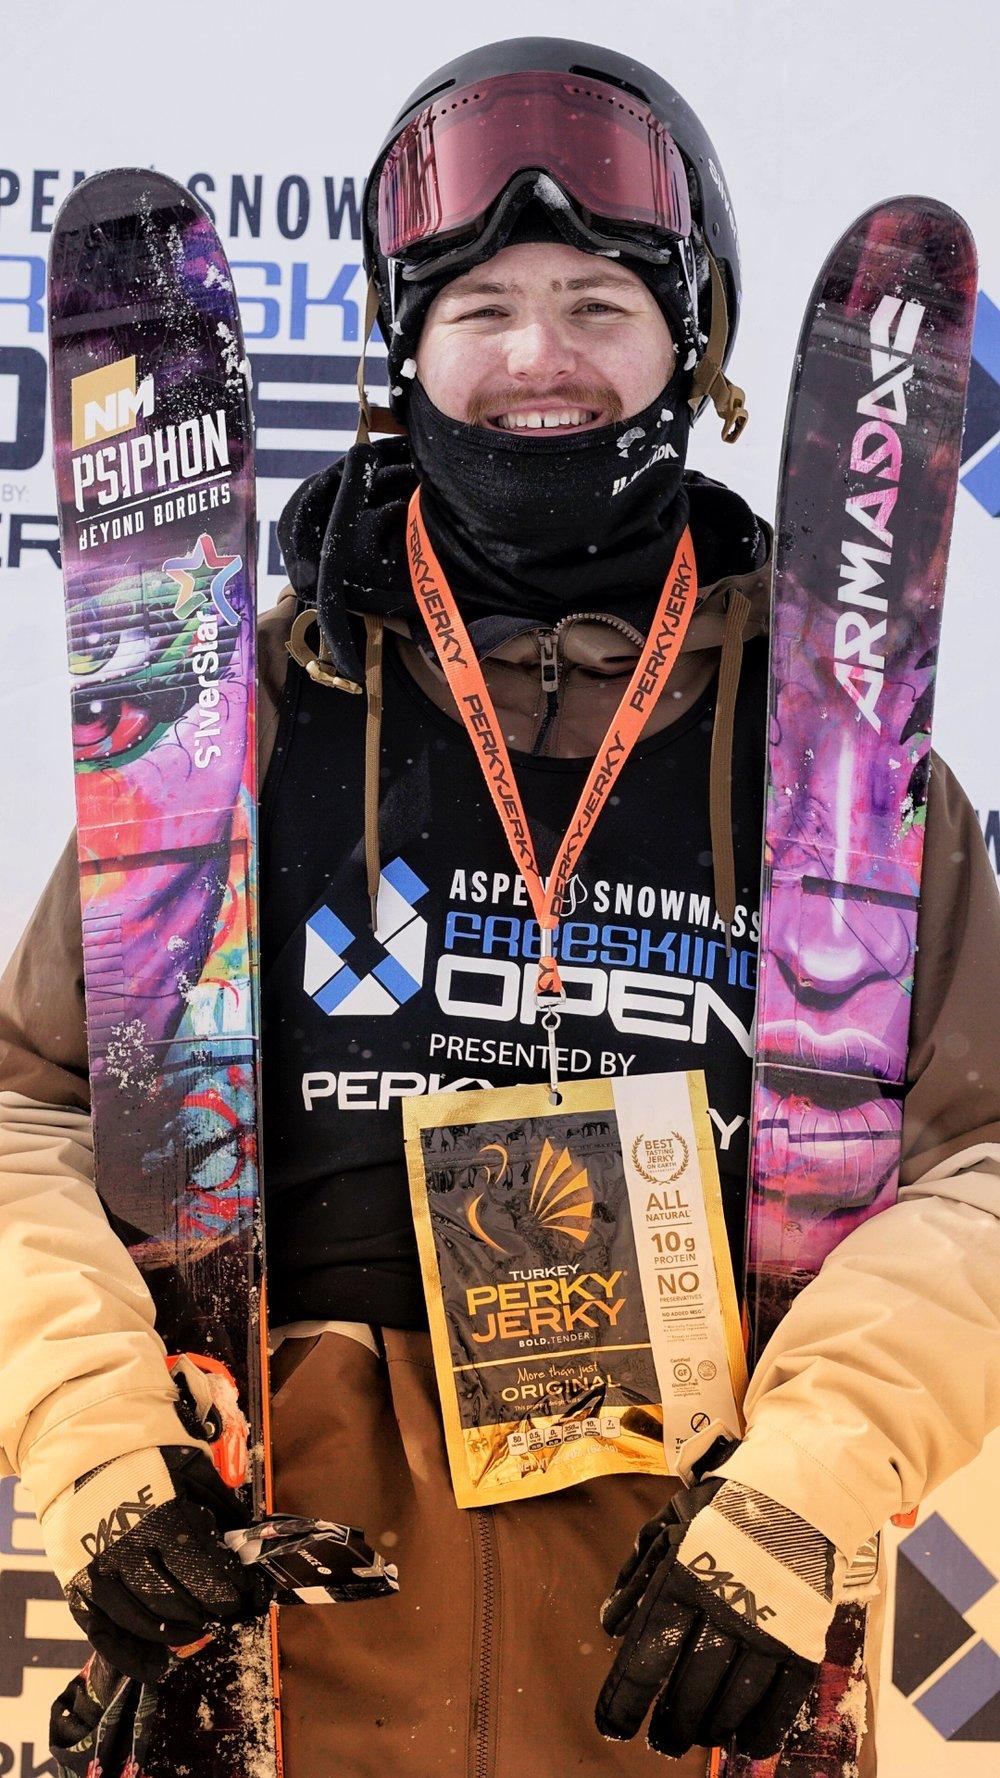 Aspen big air podium pic 4.JPG